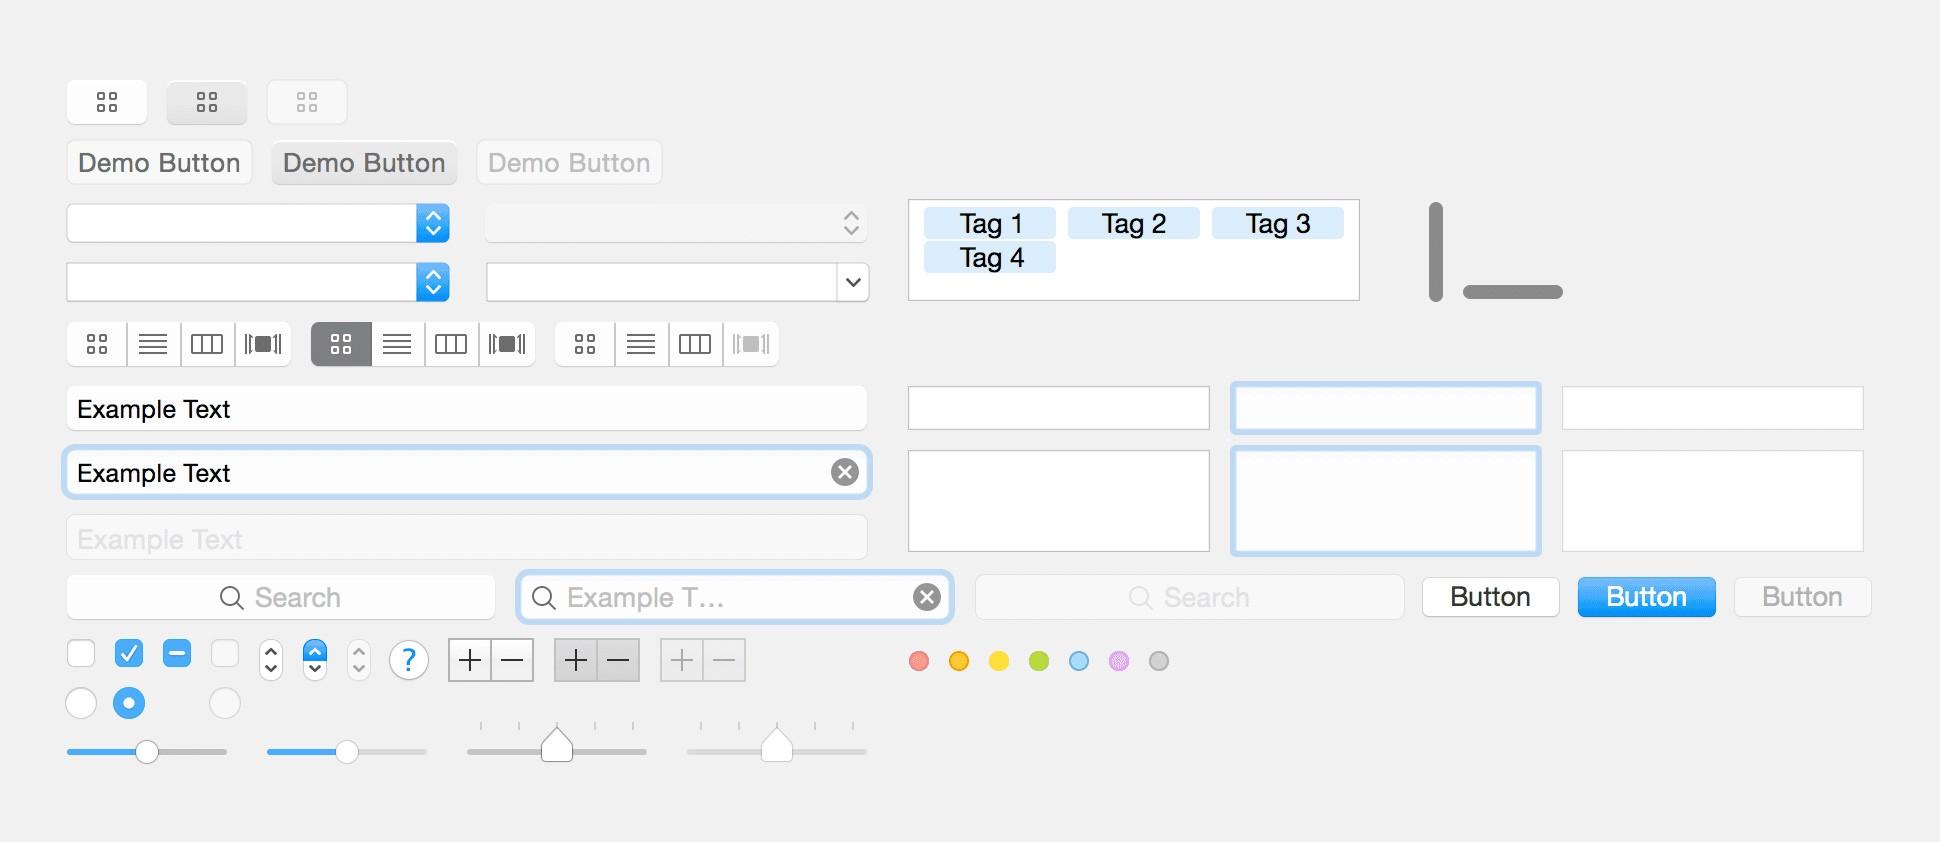 Standard UI elements